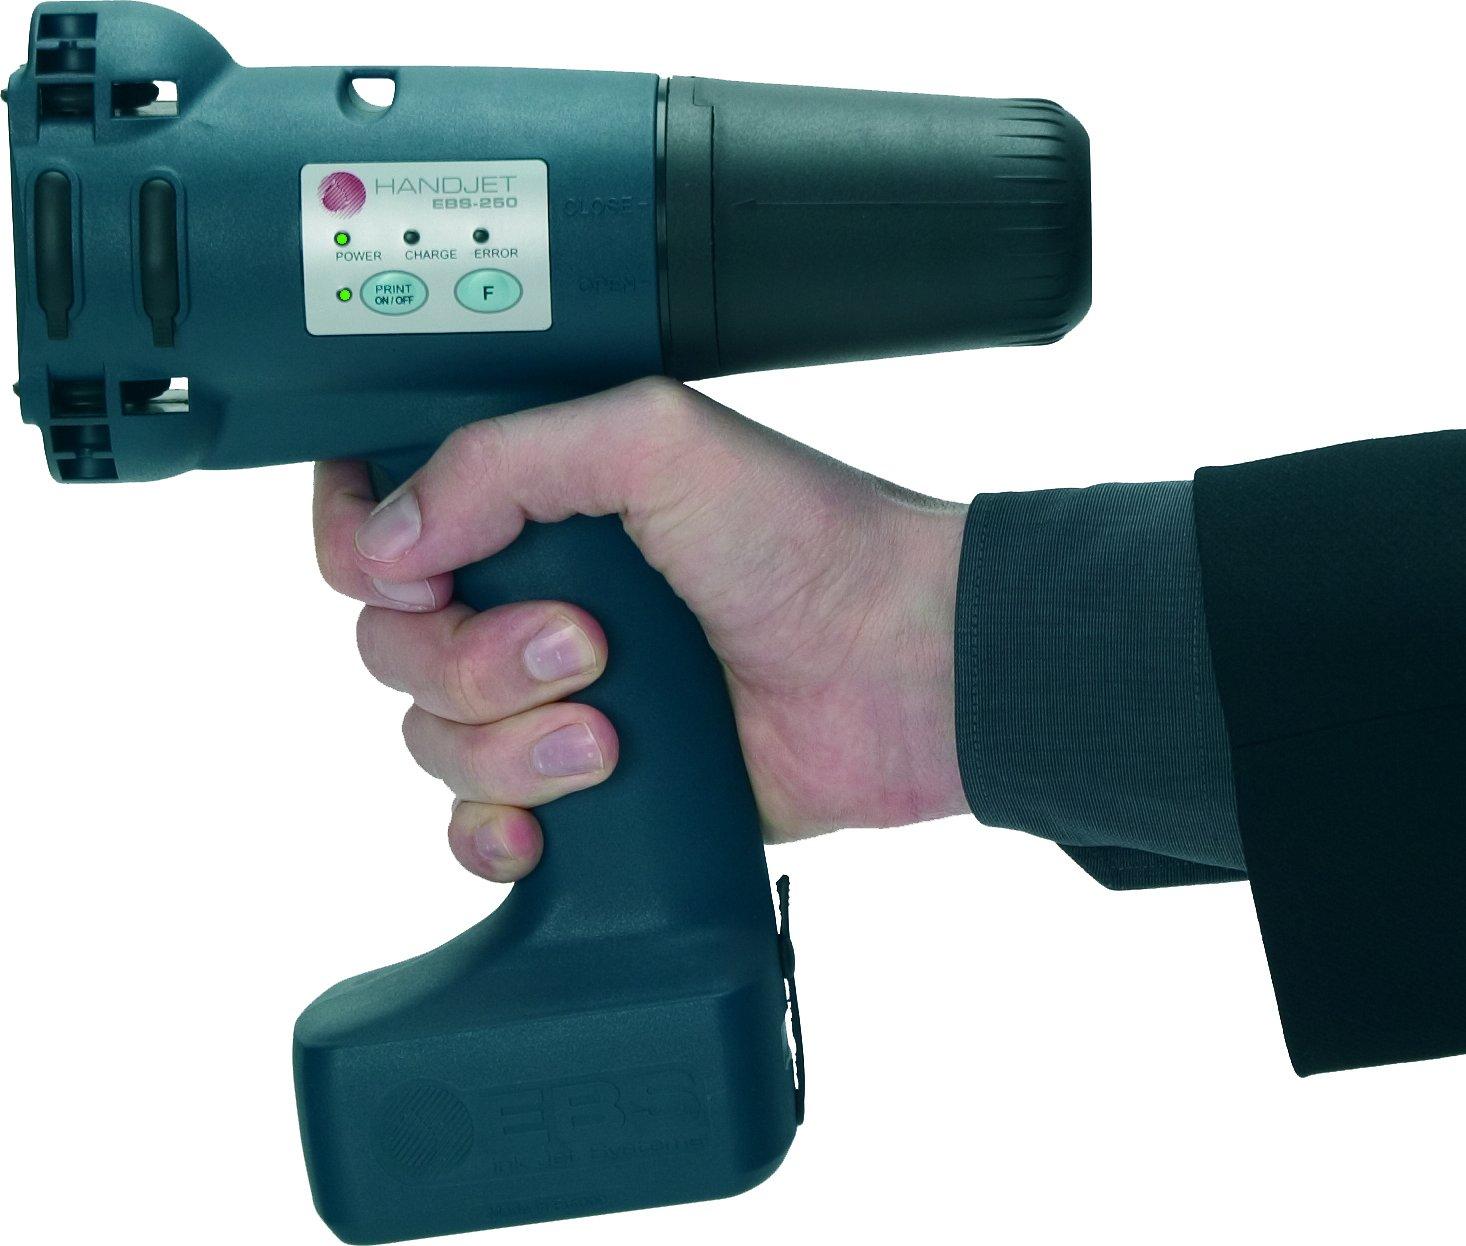 EBS Handjet 250 Ink-Jet Printing Gun -30 Msg System-Handheld